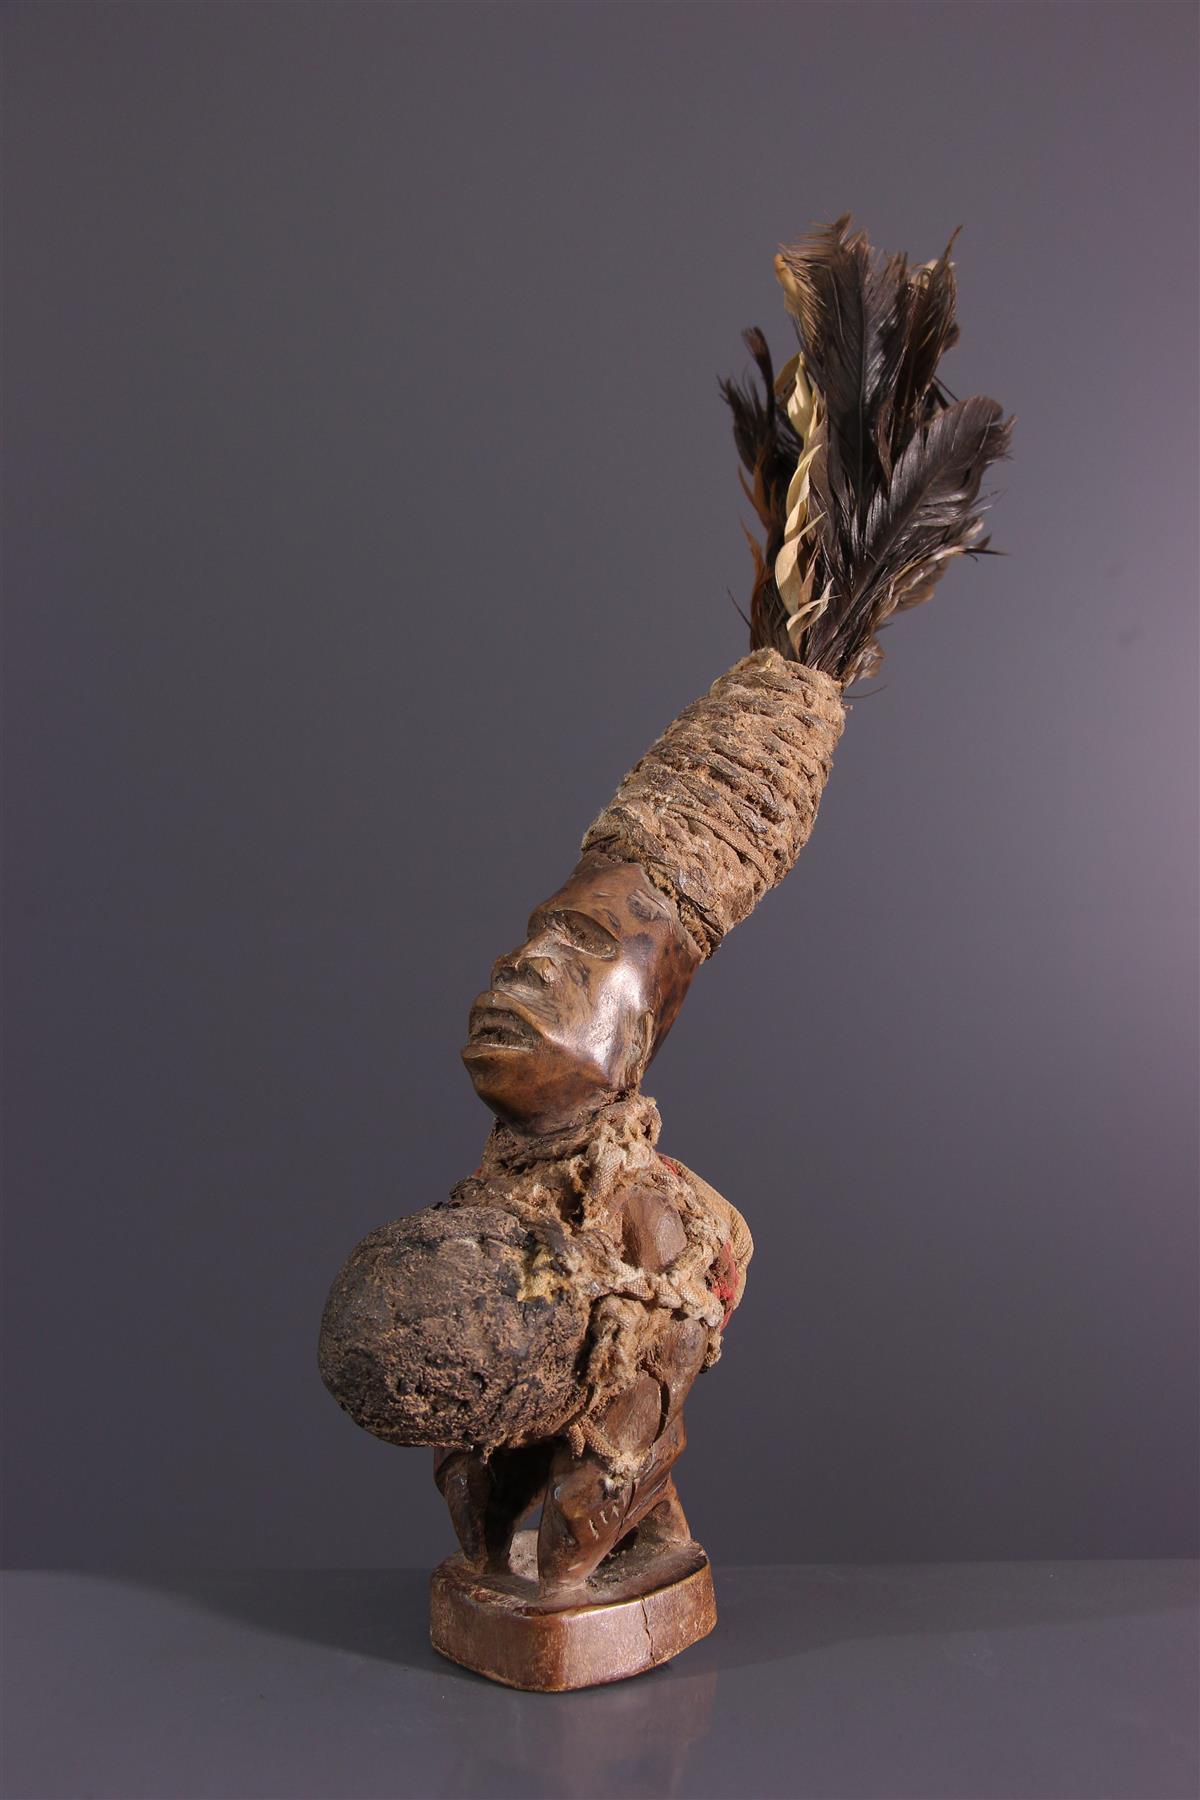 Statuette congo - African art